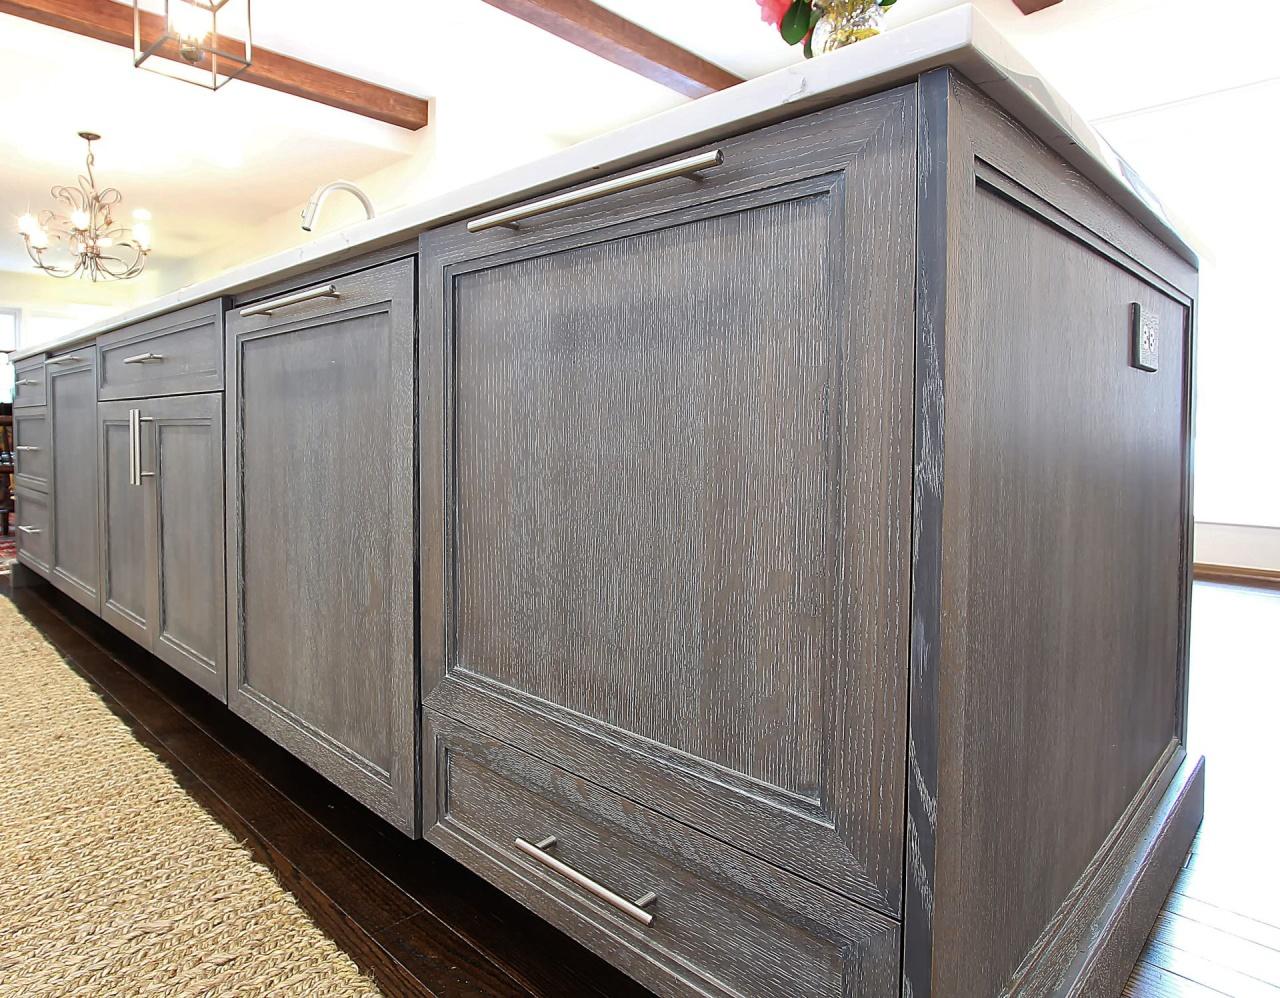 The comeback of oak walker woodworking for Cerused oak kitchen cabinets